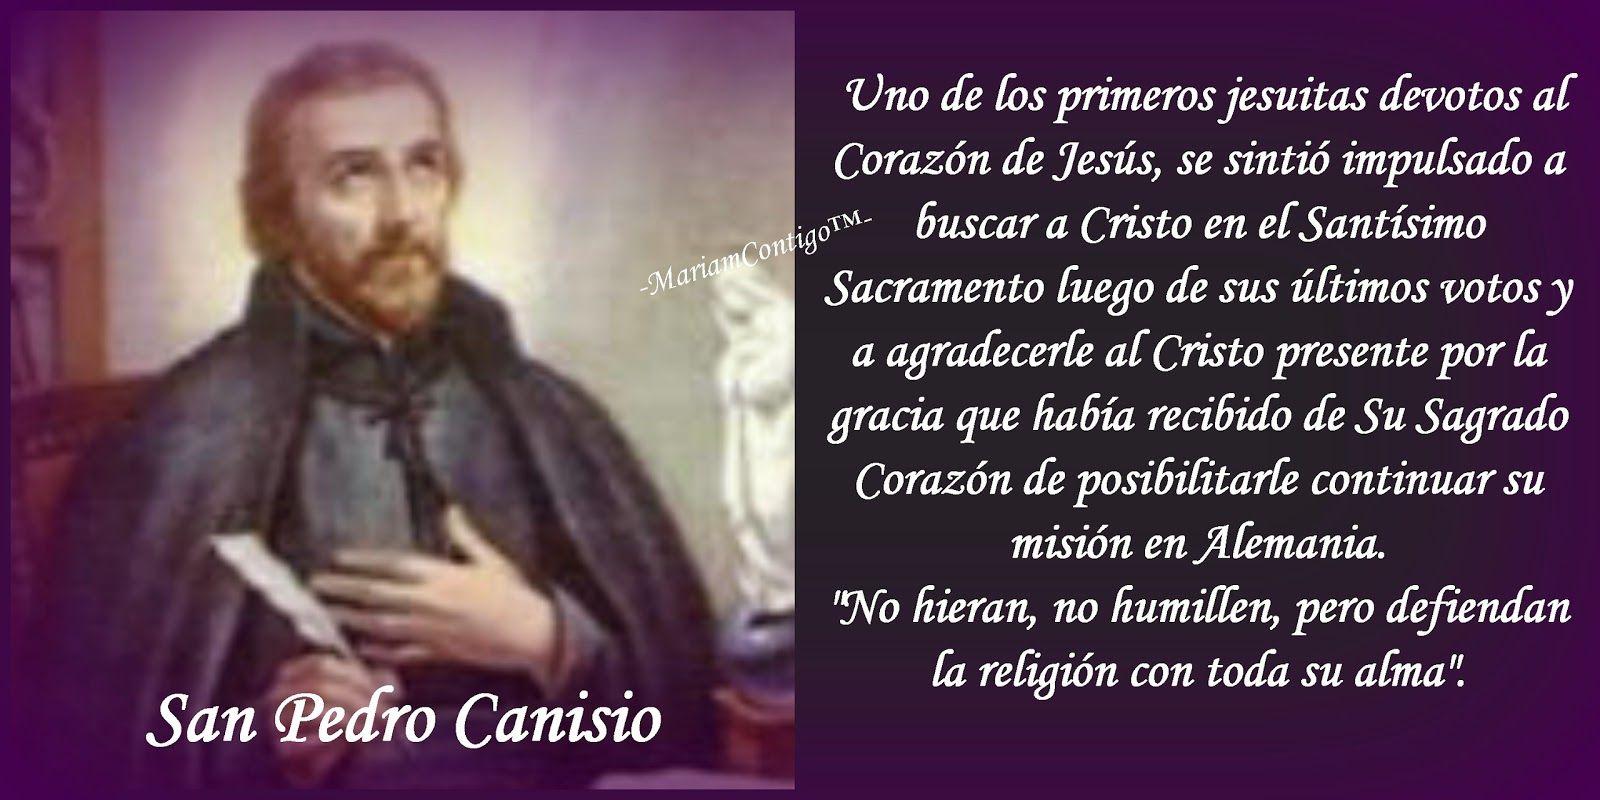 SAN PEDRO CANISIO   ' Pieter Kanijs'  Nimega,  Ducado de Güeldres, Holanda, Paises Bajos - Friburgo, Suiza   (1521 †1597)  Beatificado...